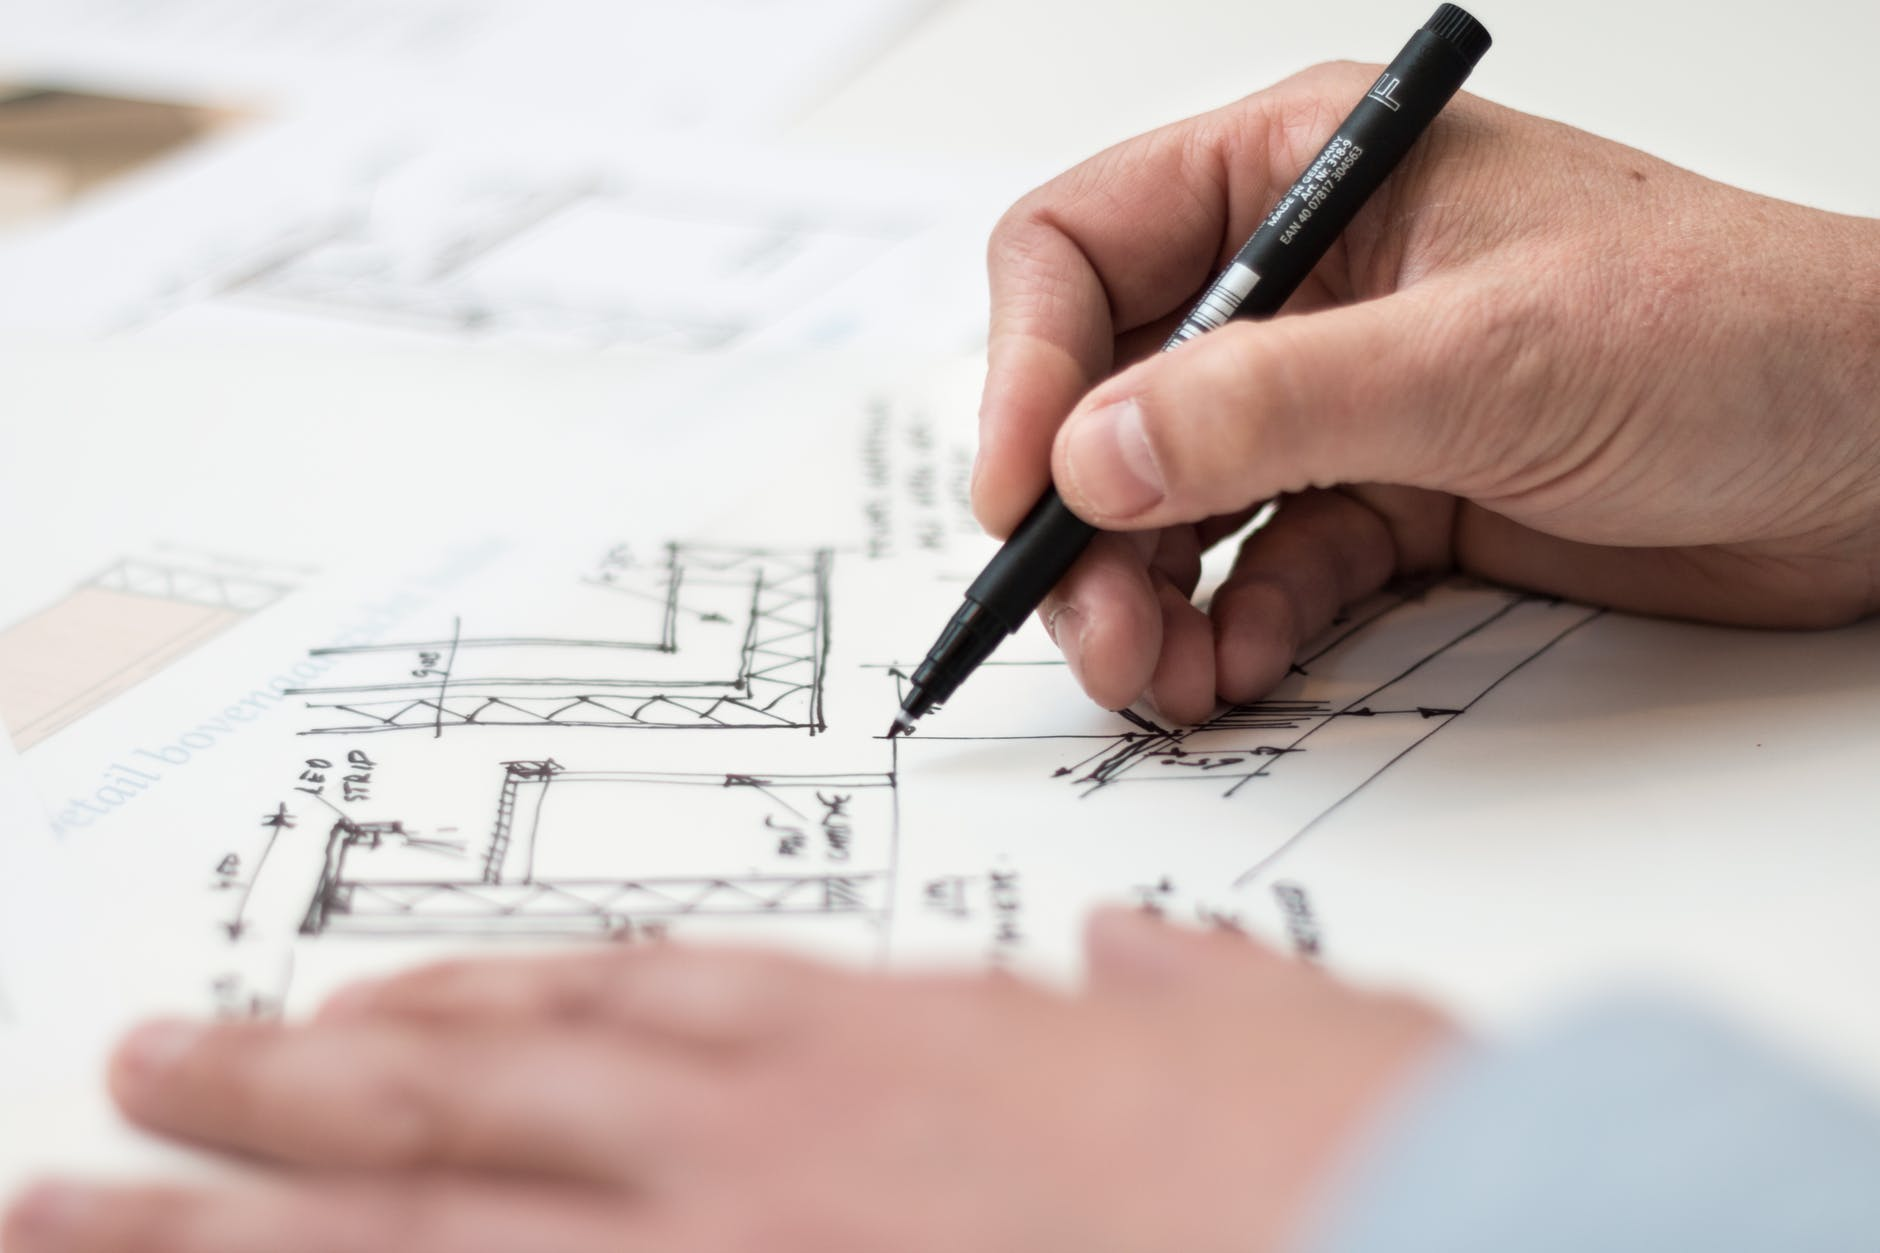 plán, architekt